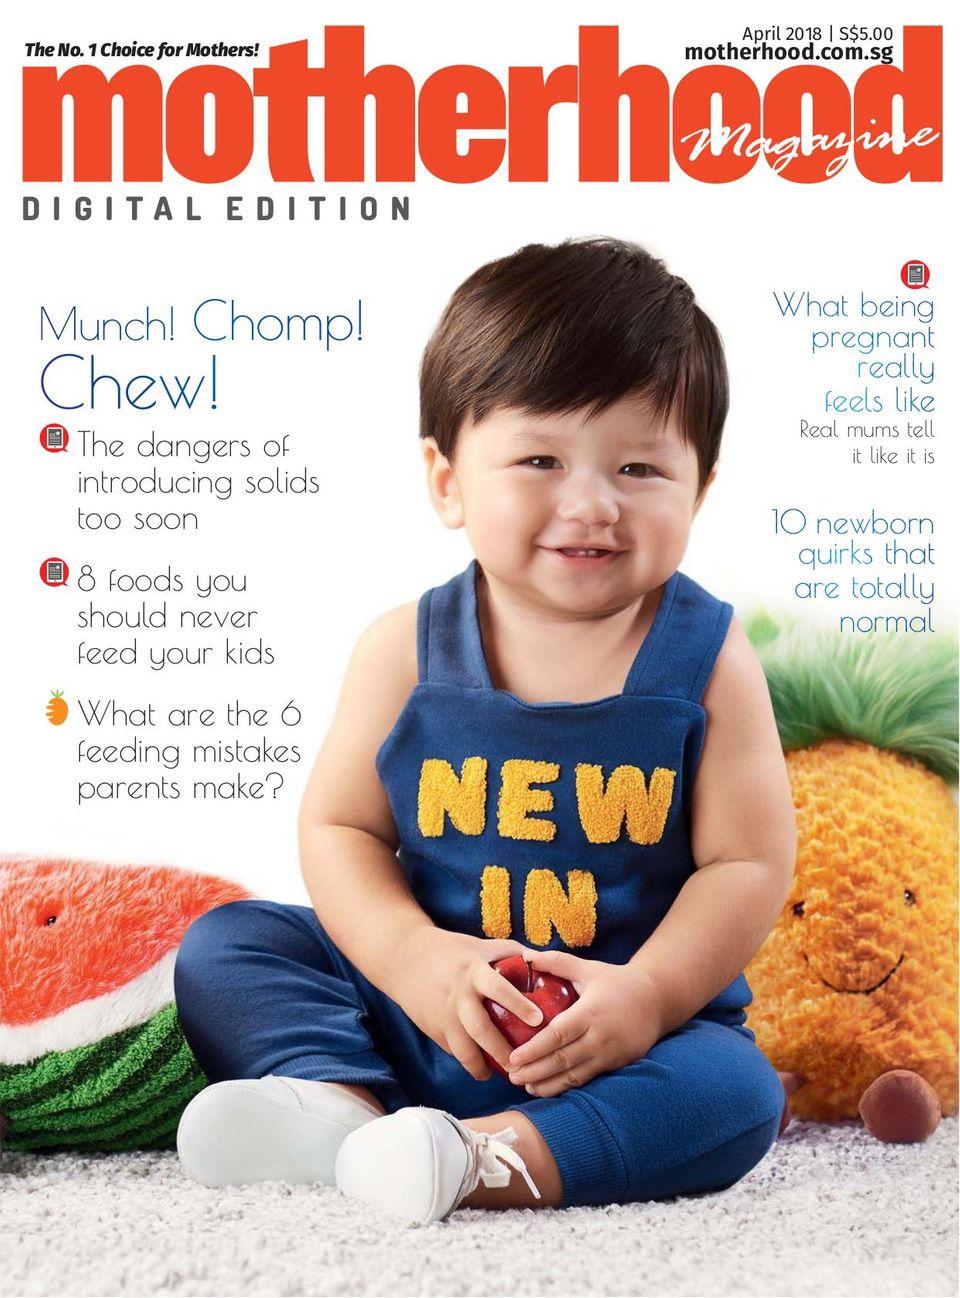 Get Your Digital Copy Of Motherhood Magazine April 2018 Issue